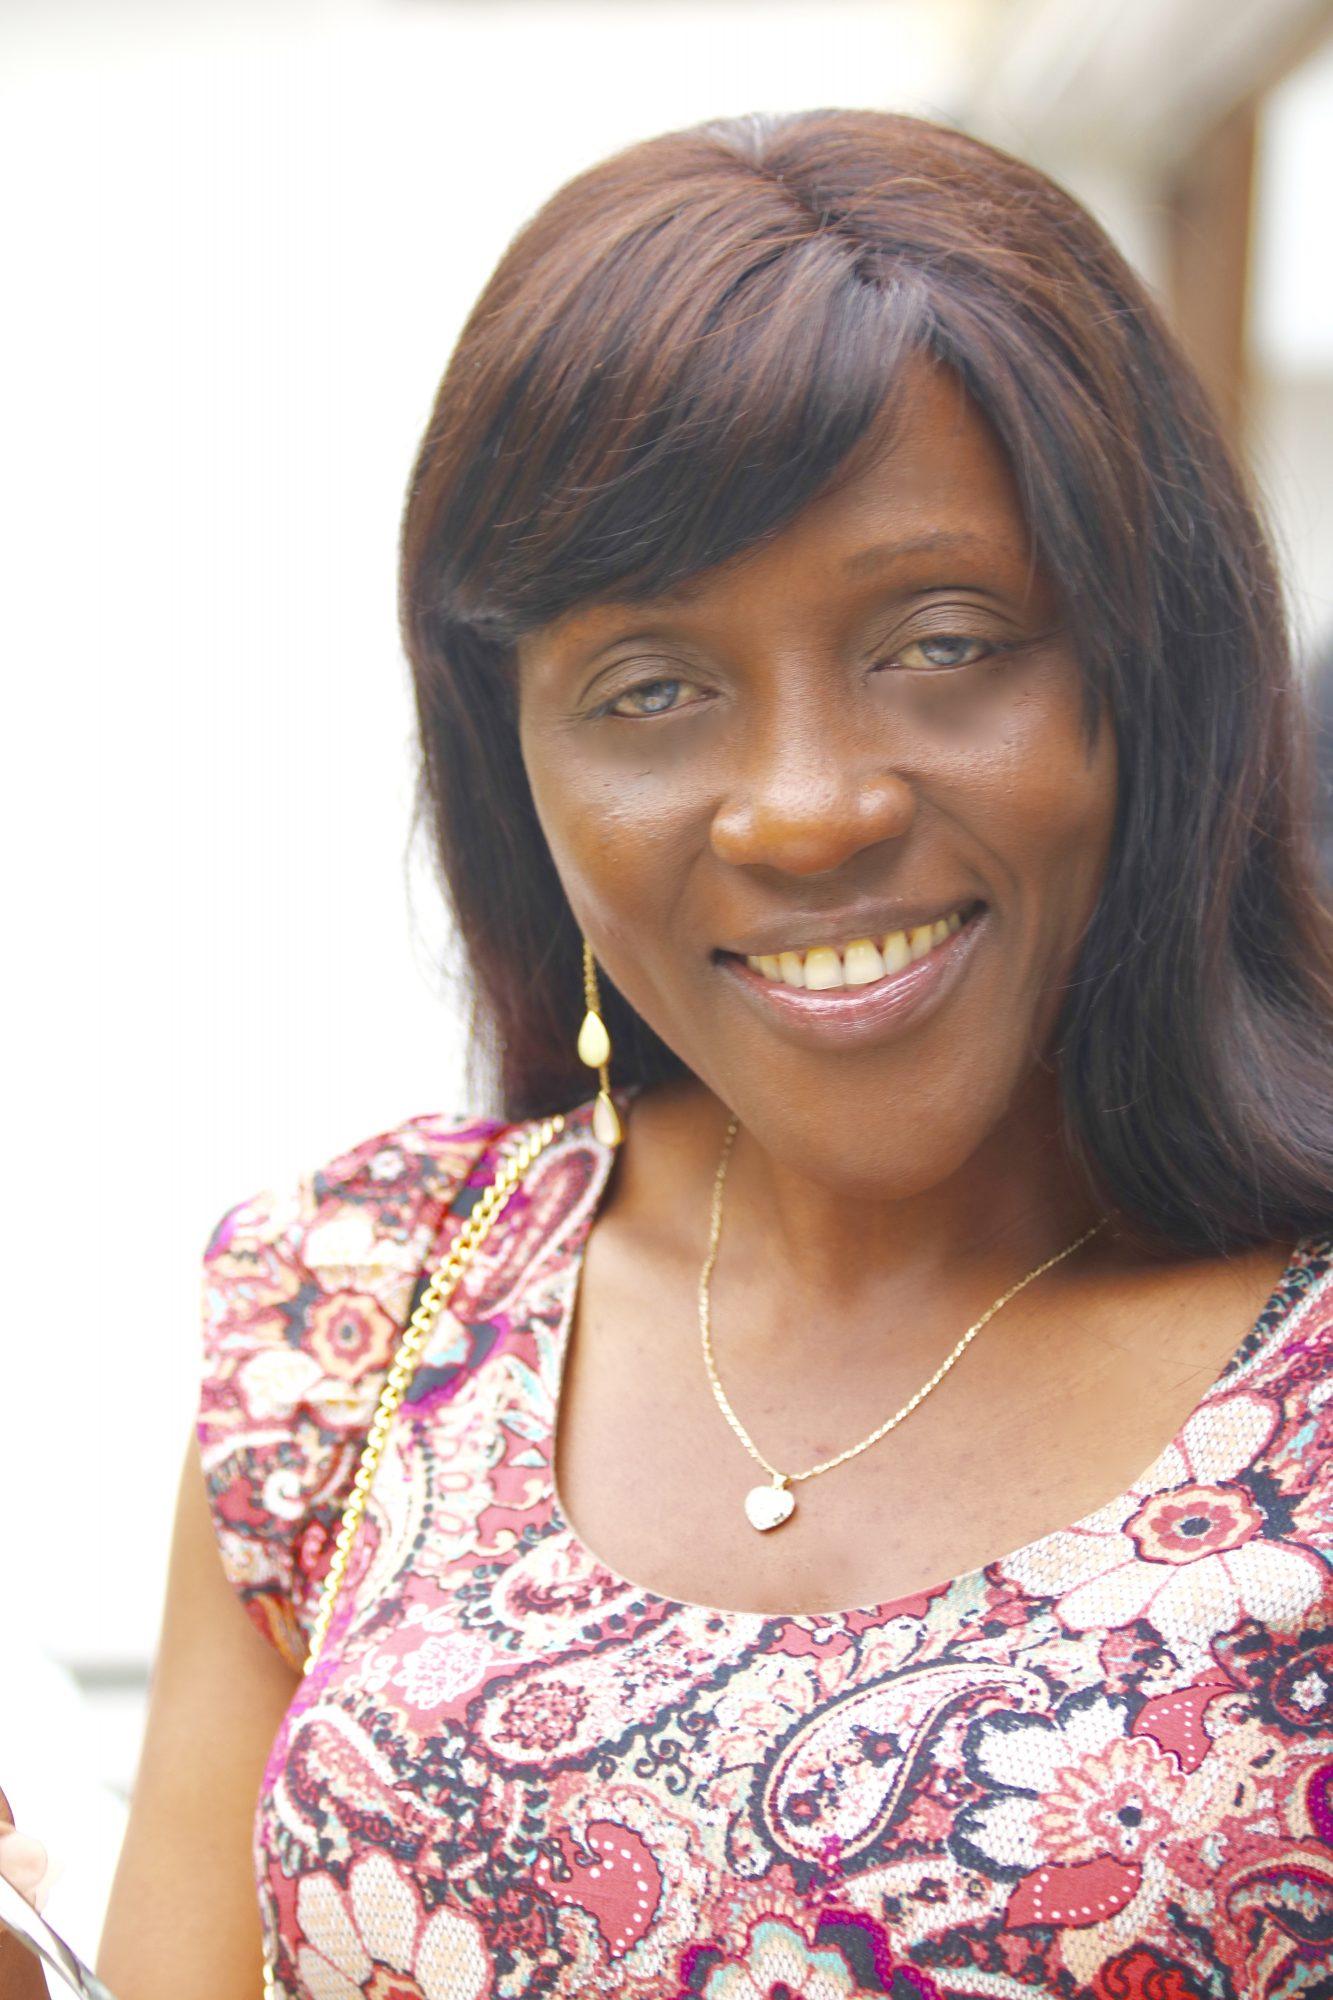 VERA CRIGHTON CAMEROONIAN WOMEN